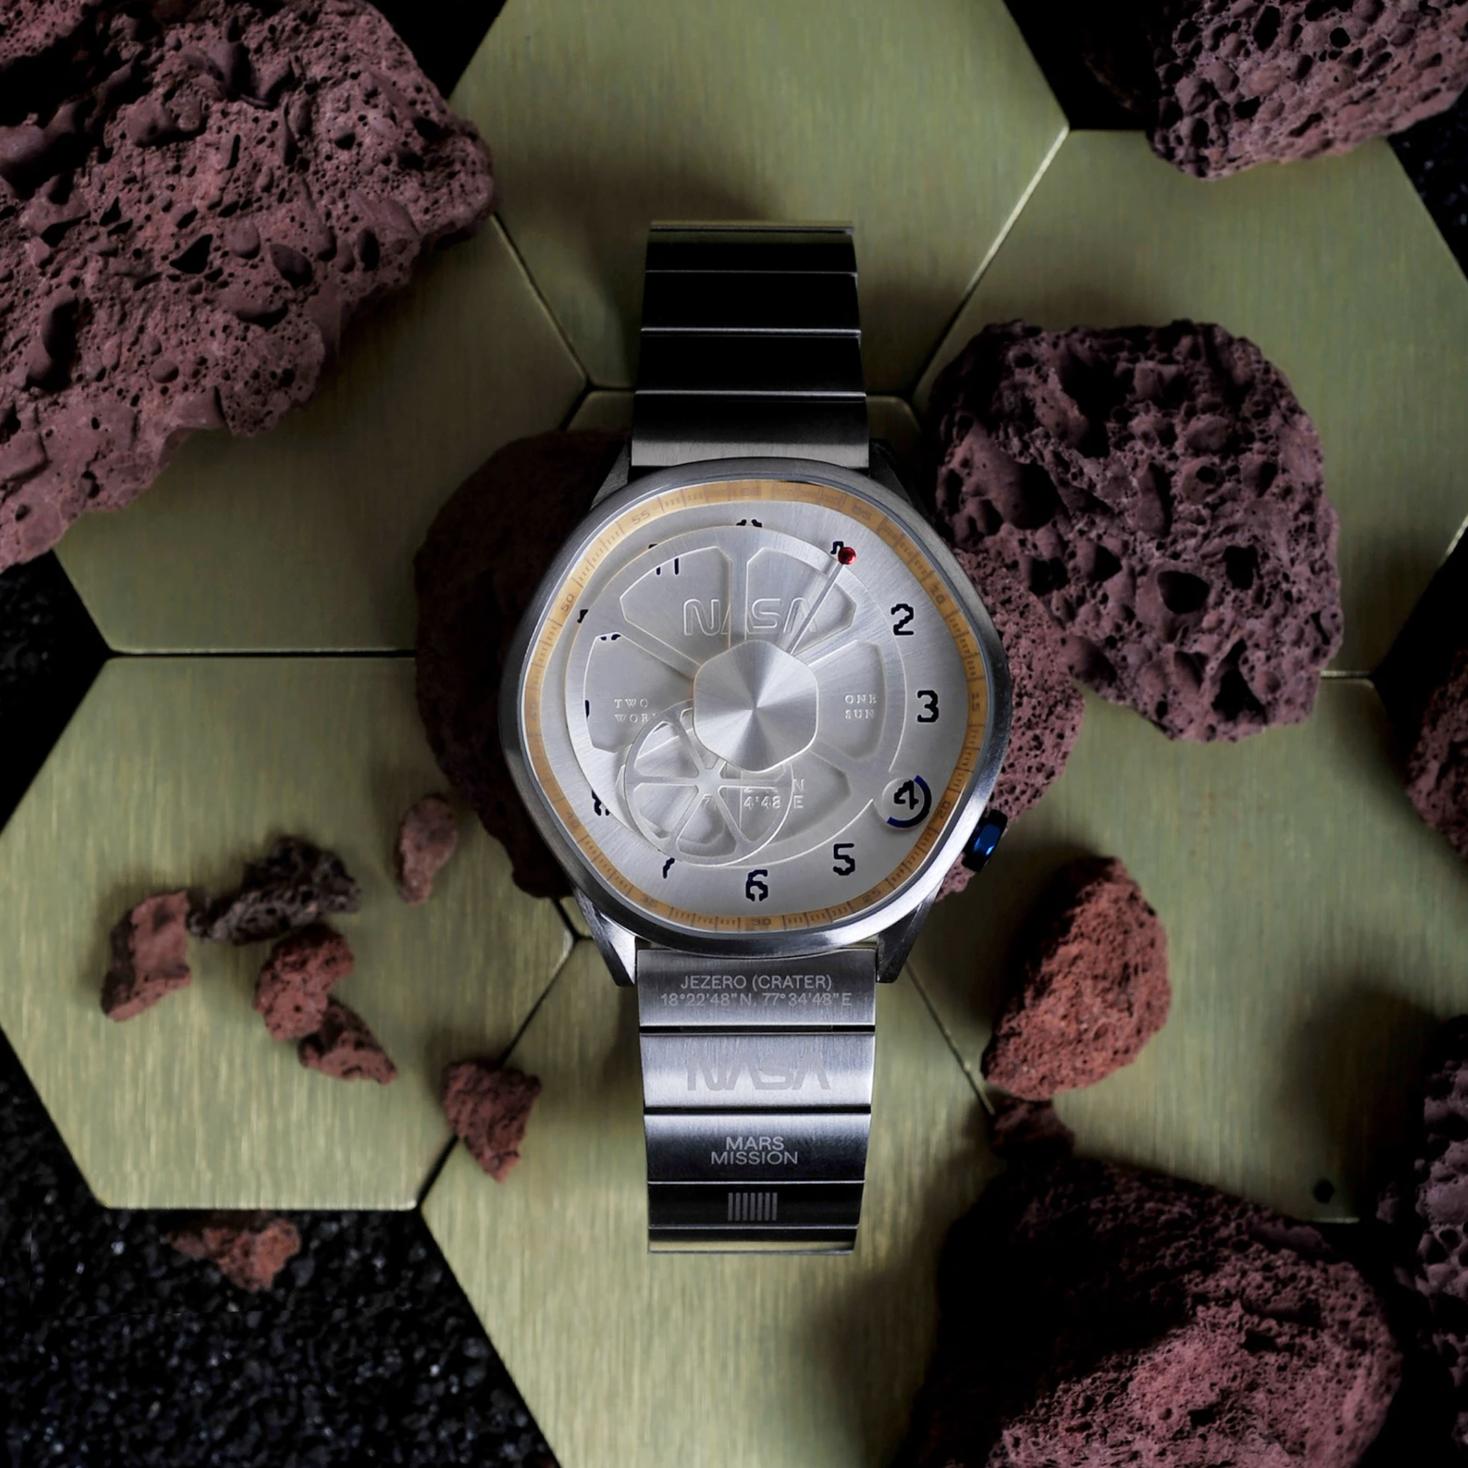 Anicorn NASA Mars Time pricing review 2020